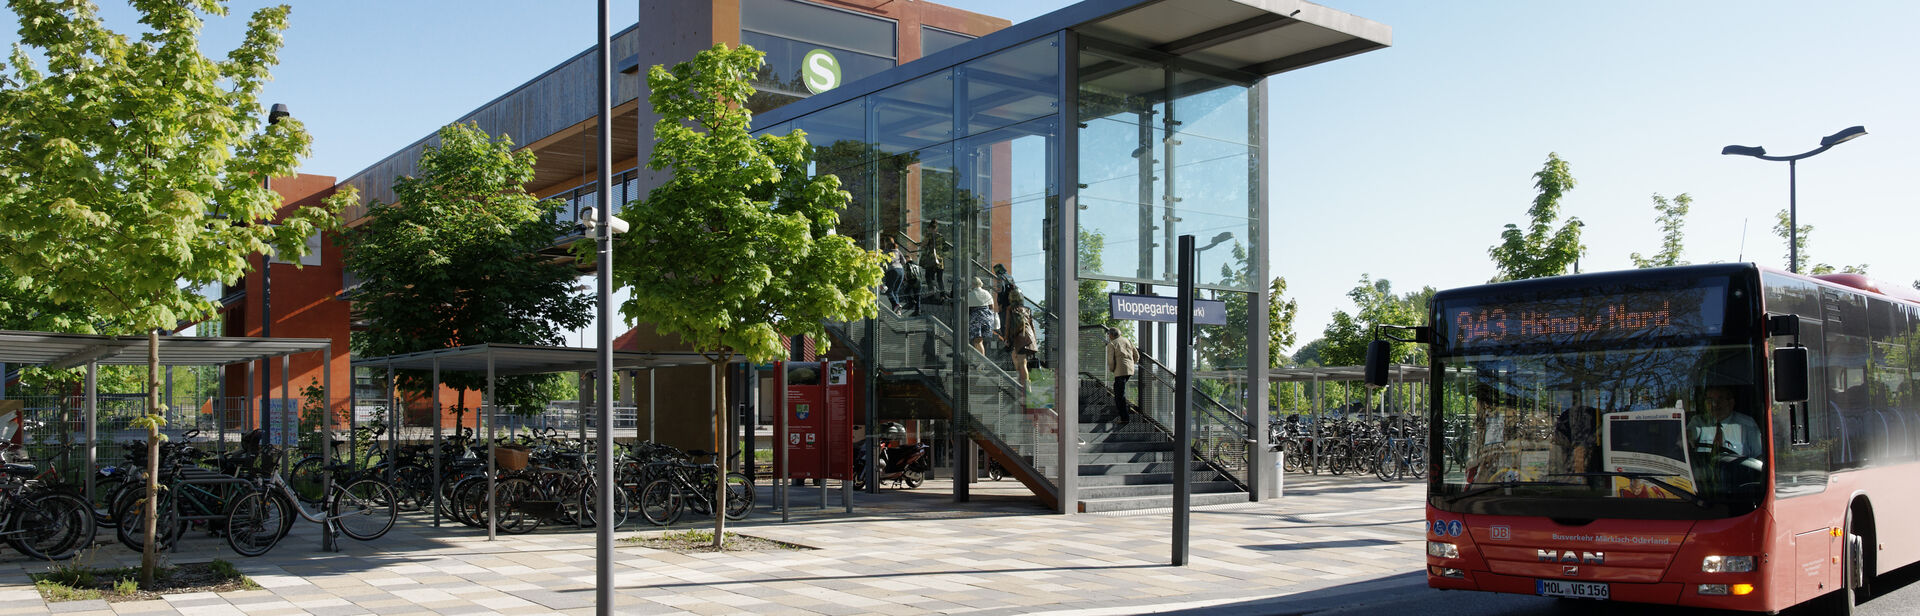 S-Bahnhof Hoppegarten